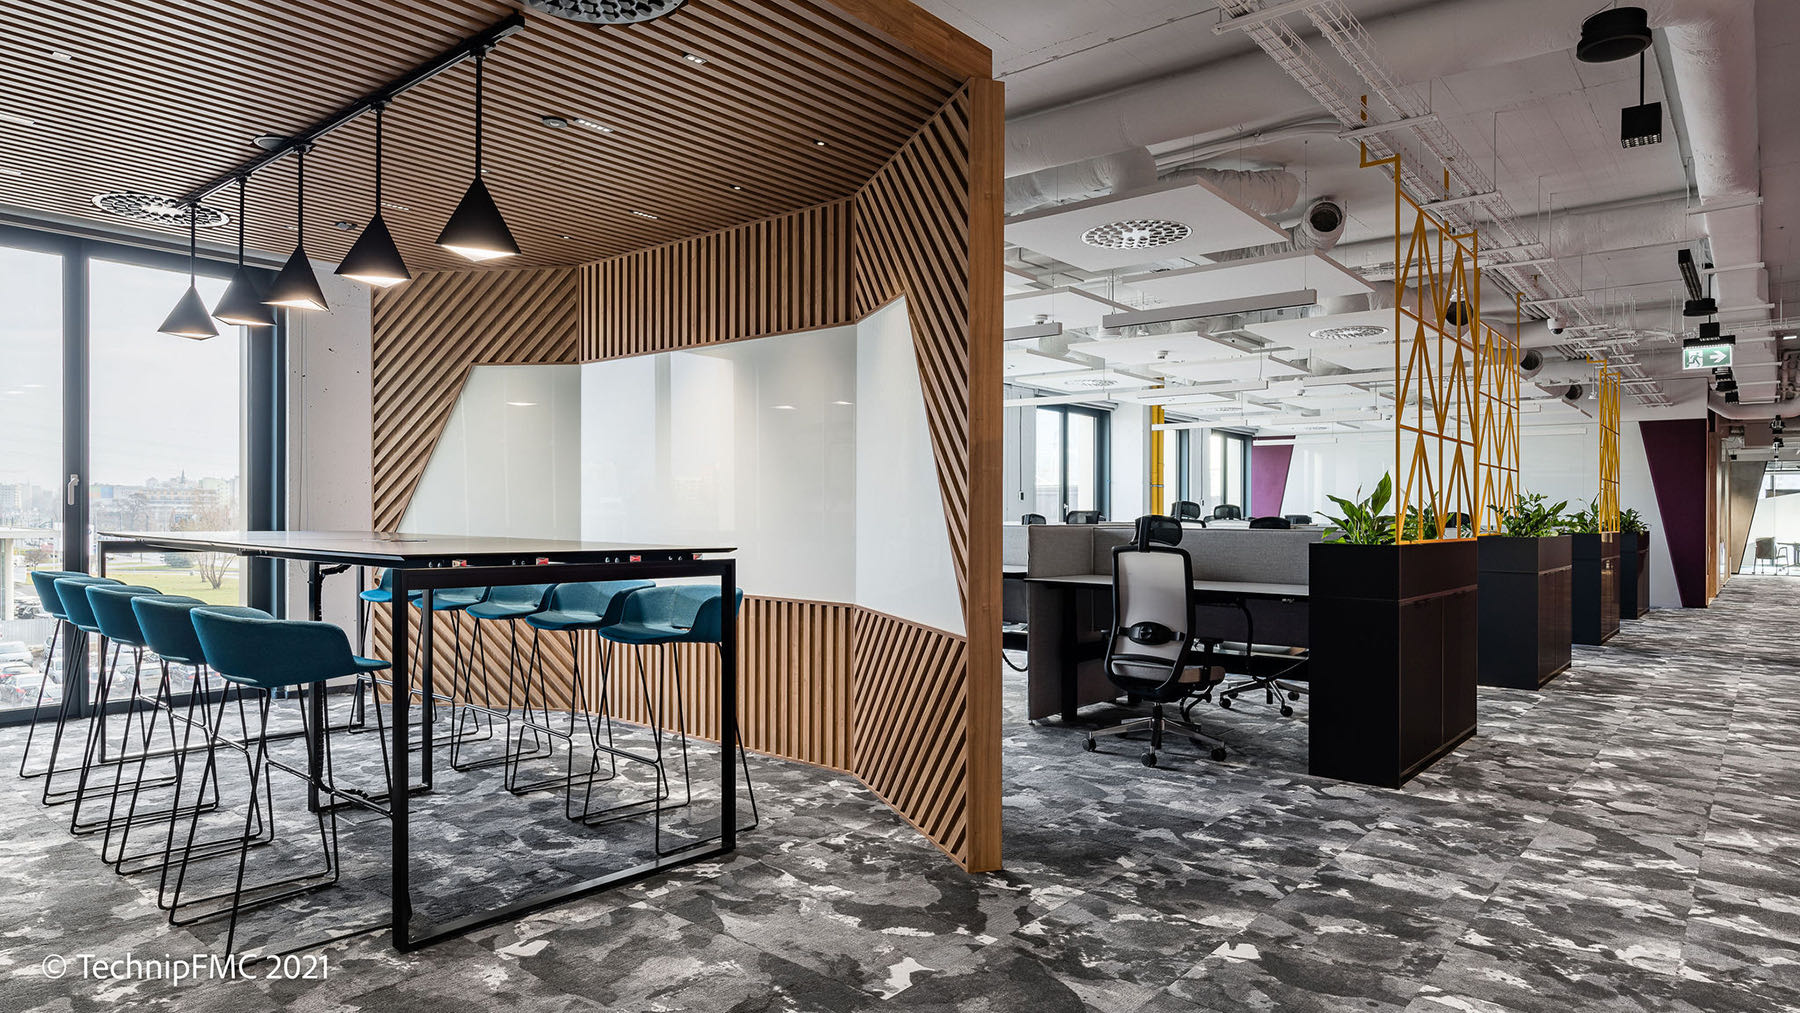 technip-fmc-krakow-office-9